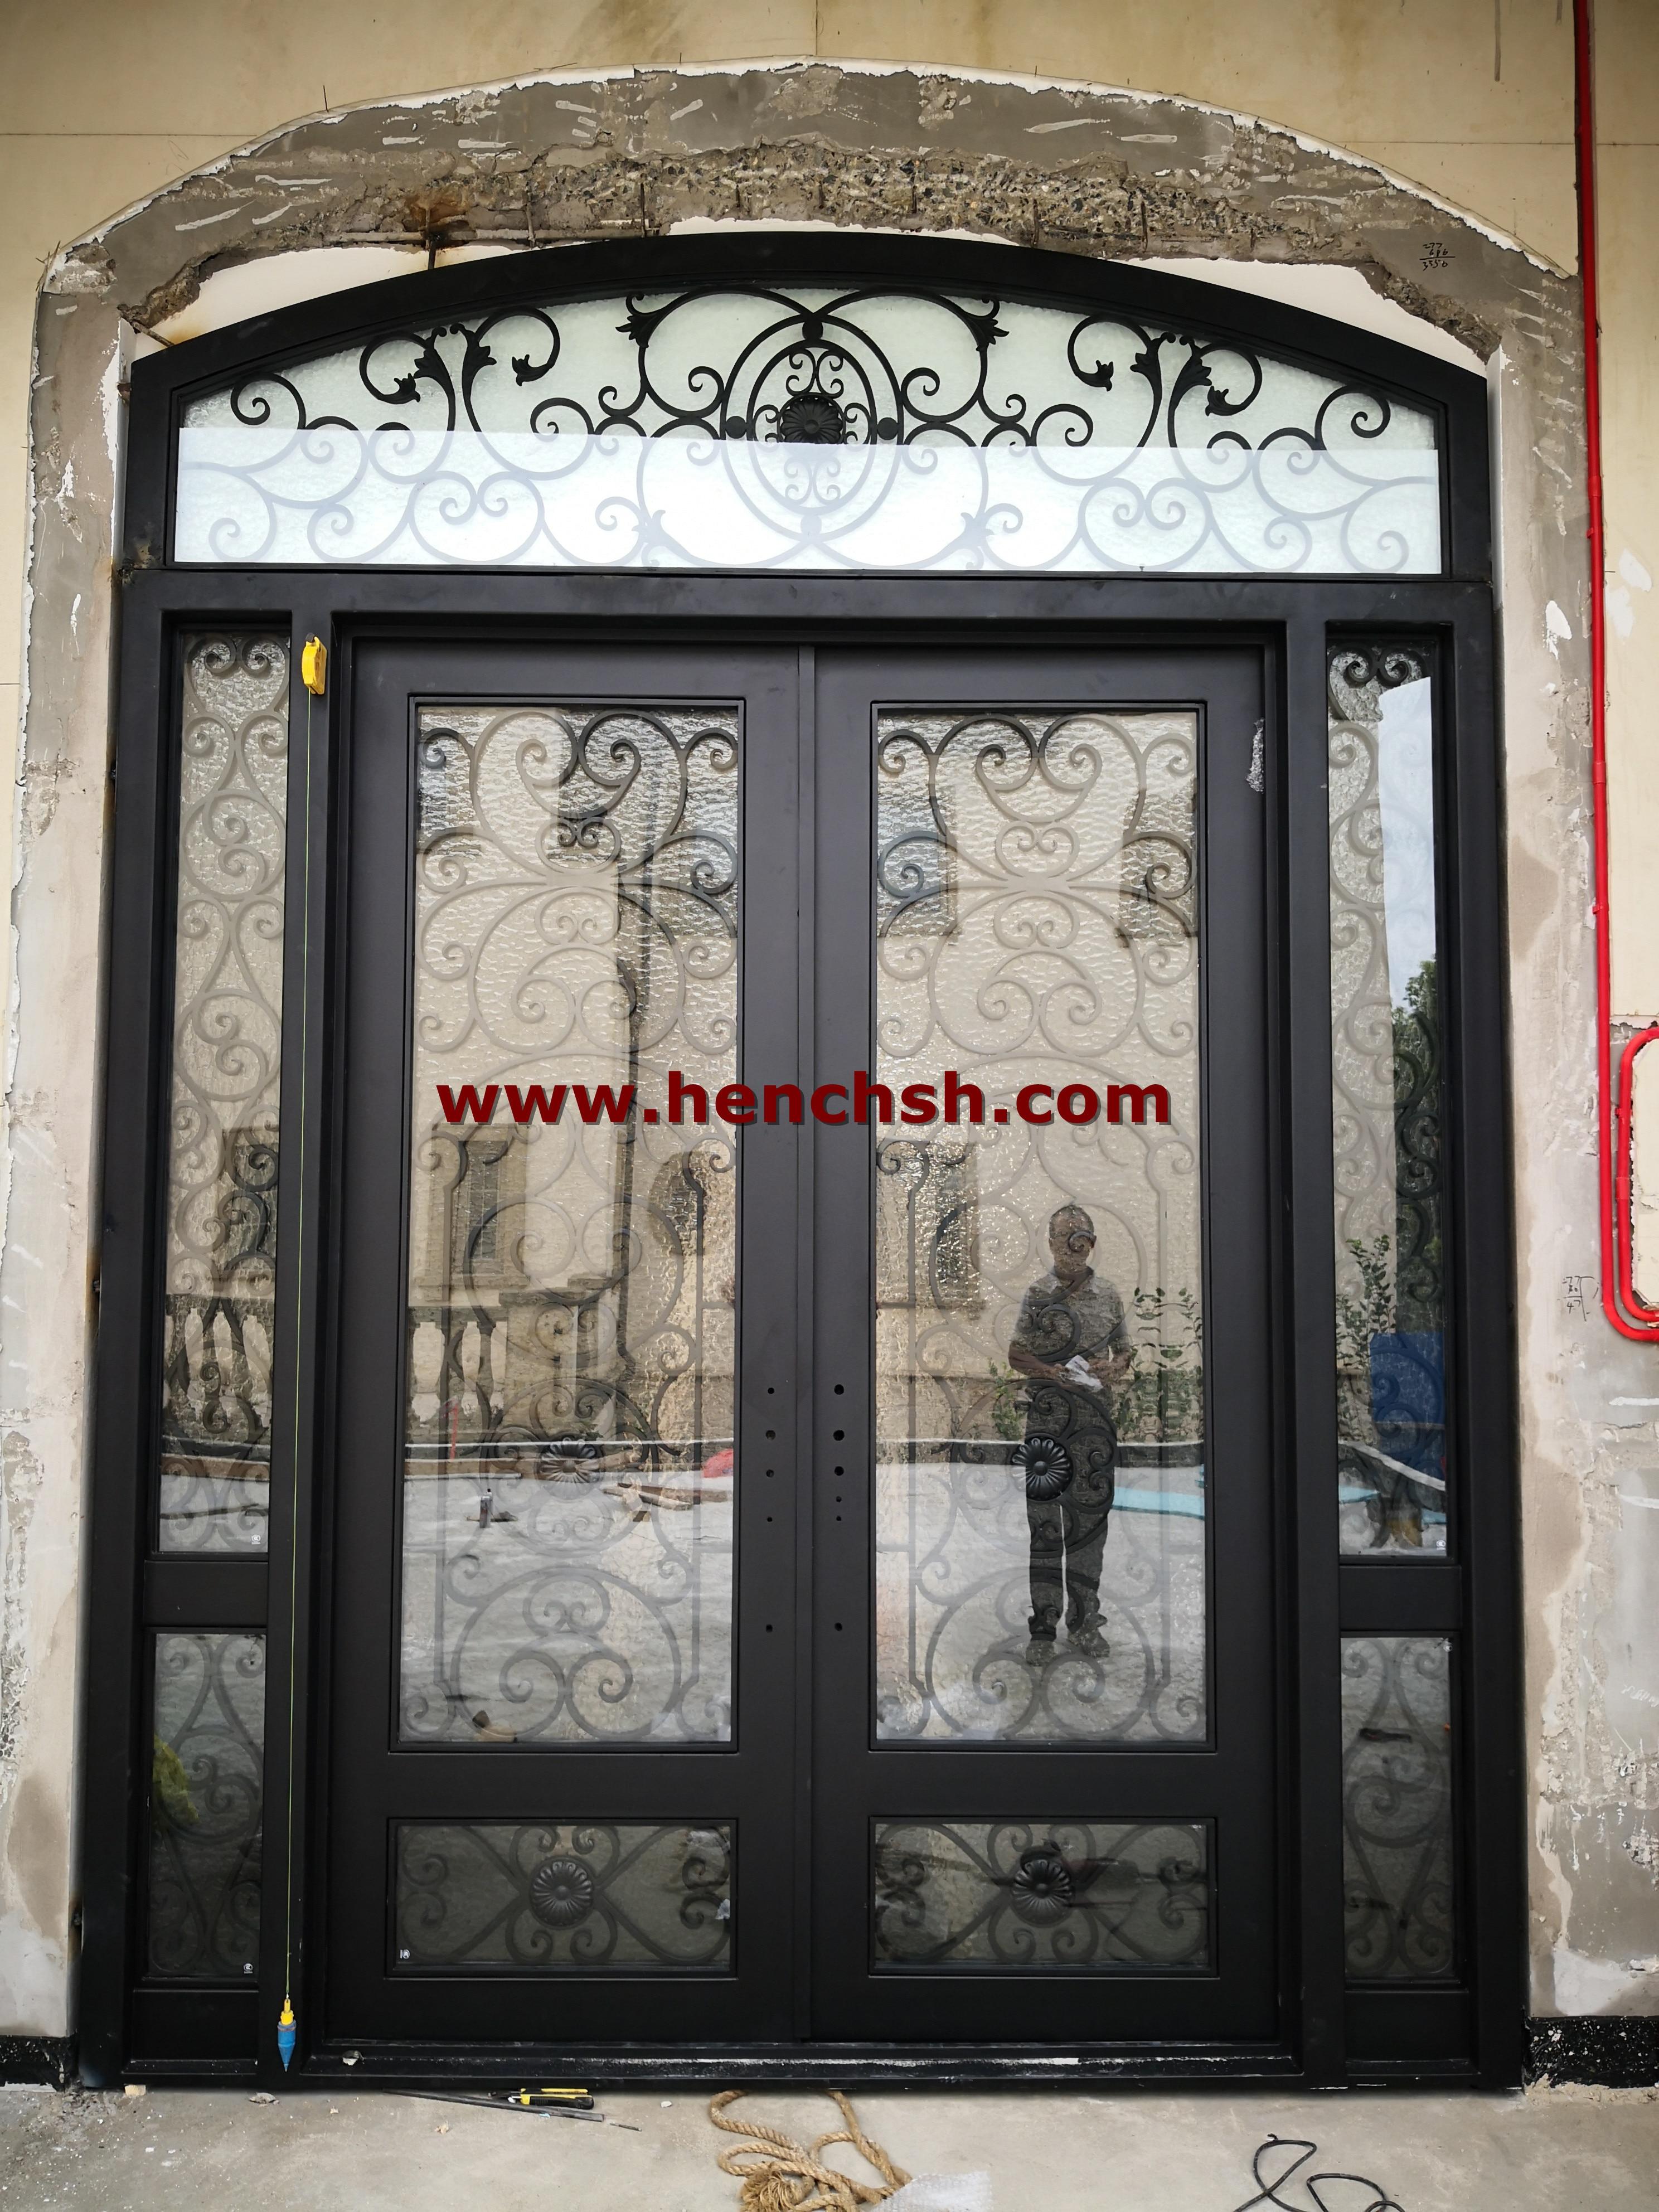 Hench Shanghai Top Quality Iron Doors